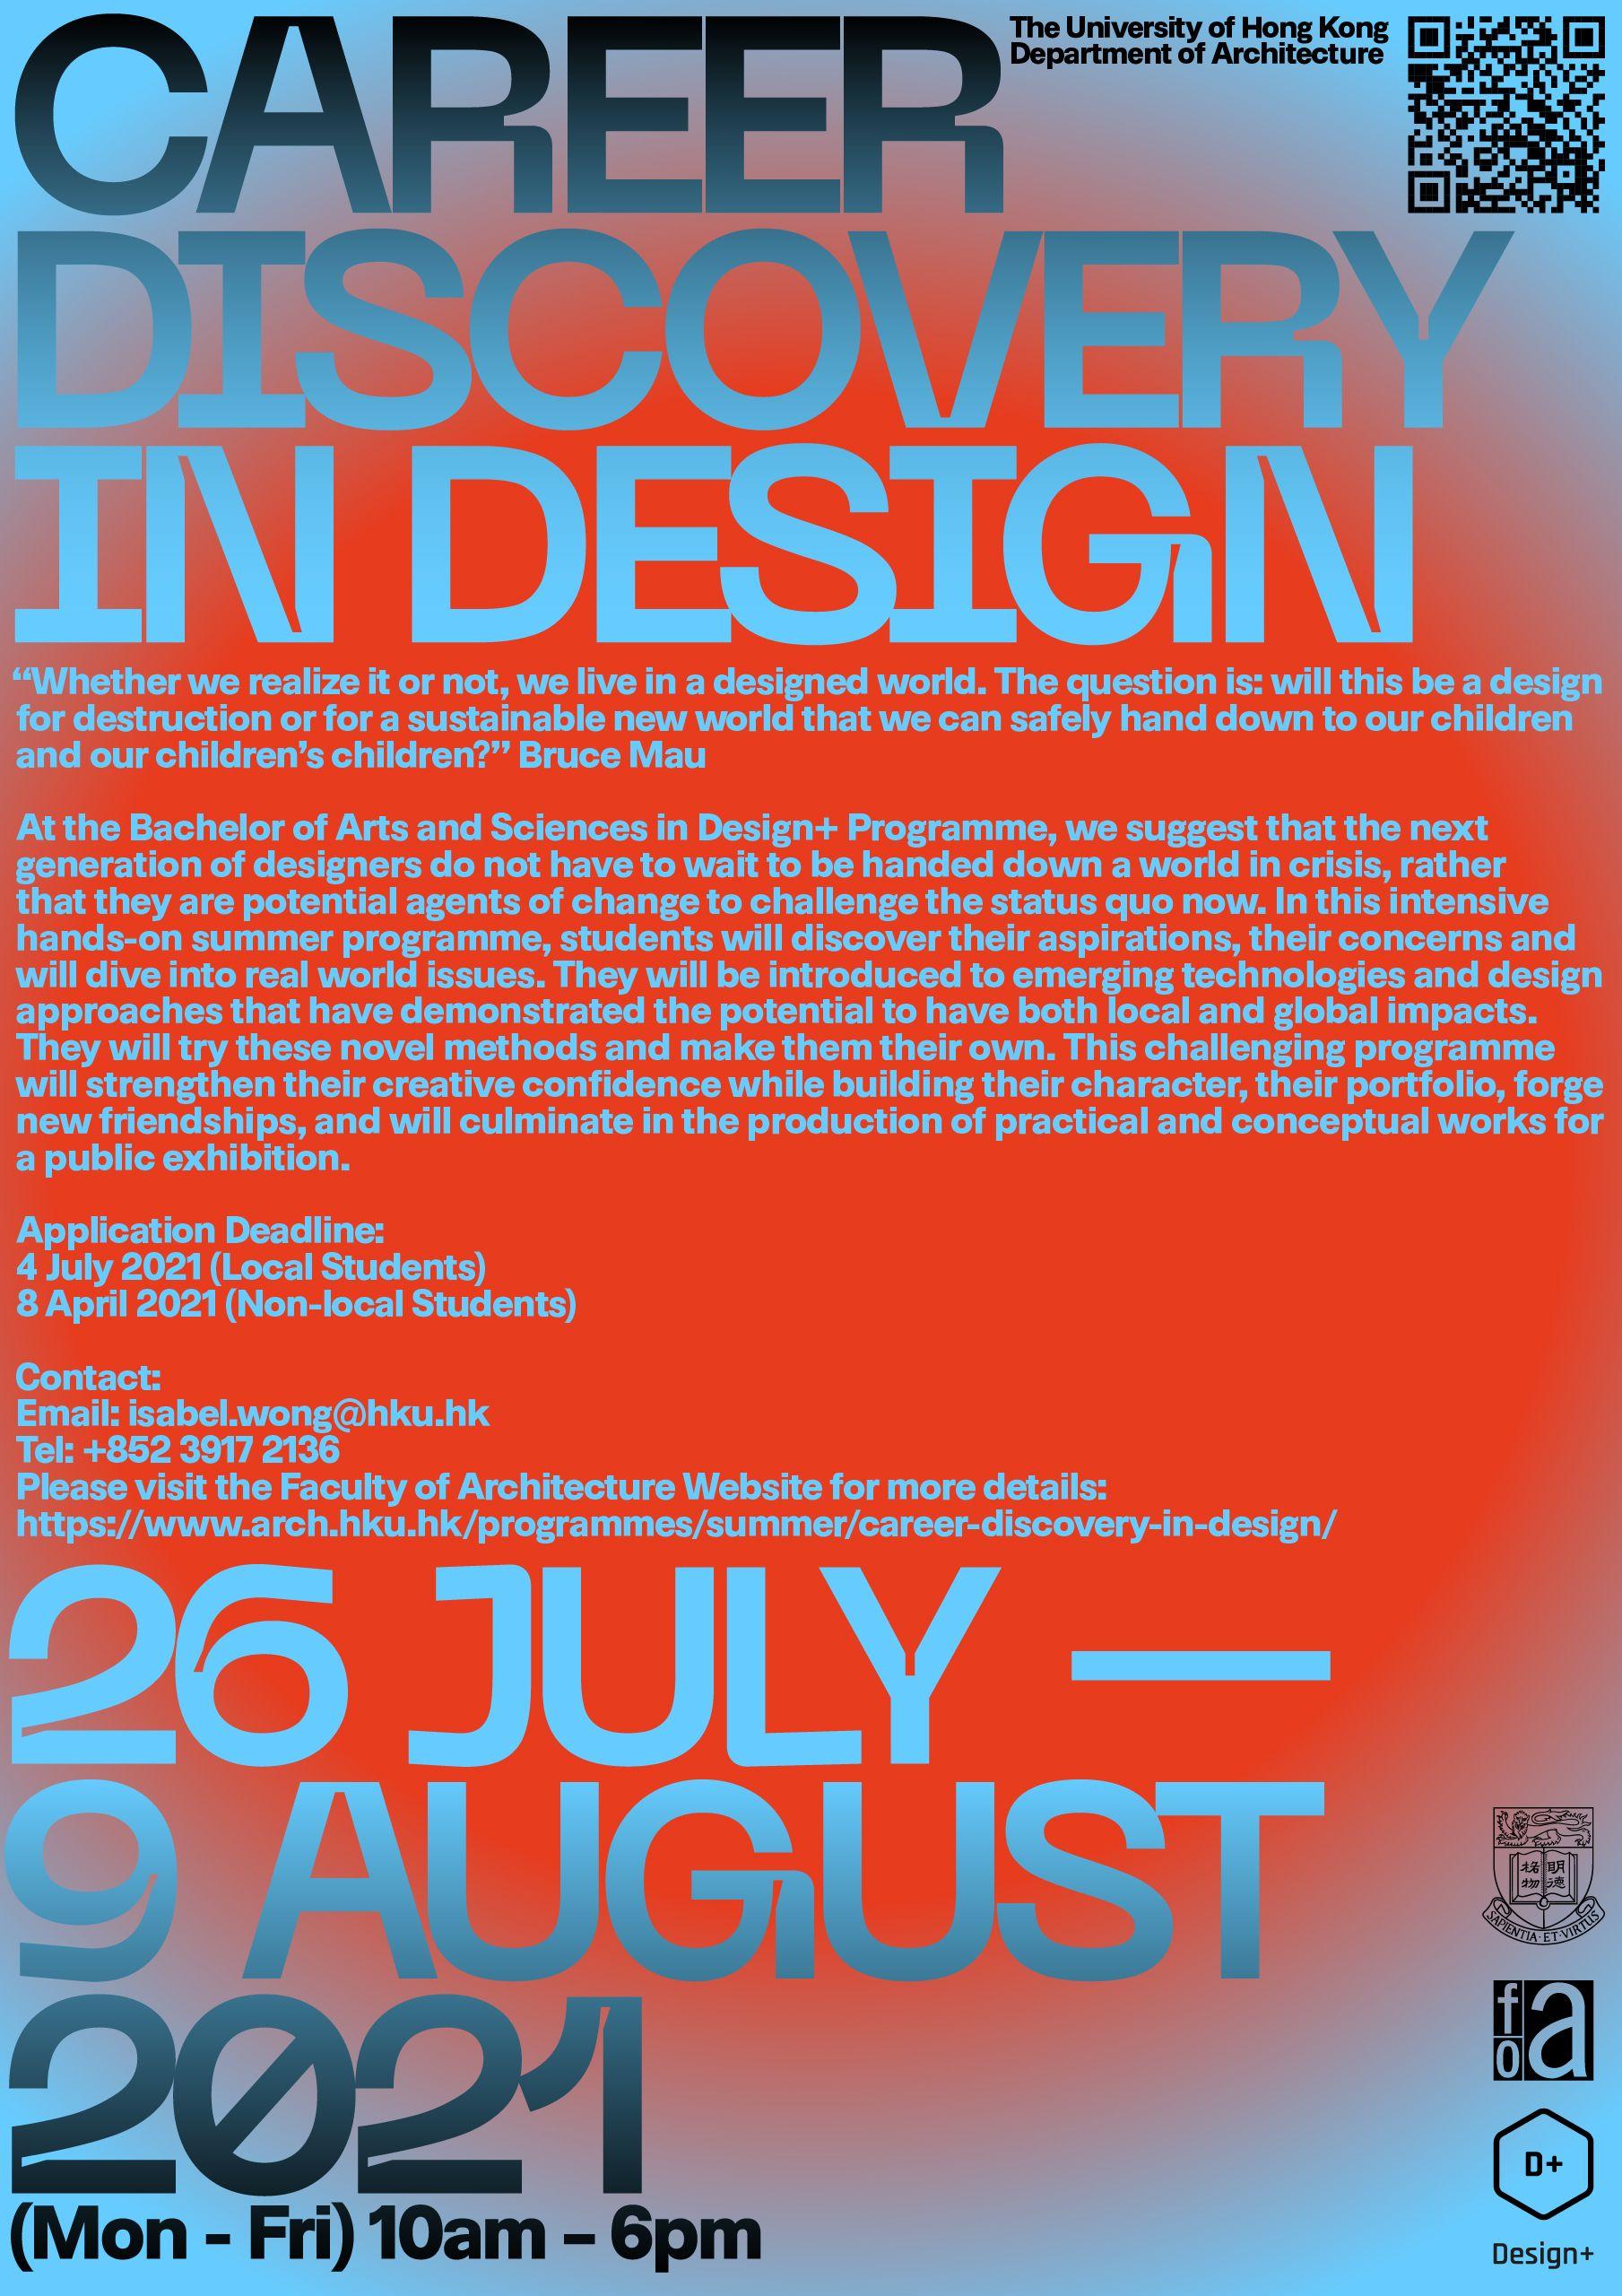 Poster of Career Disocveryin Design 2021_